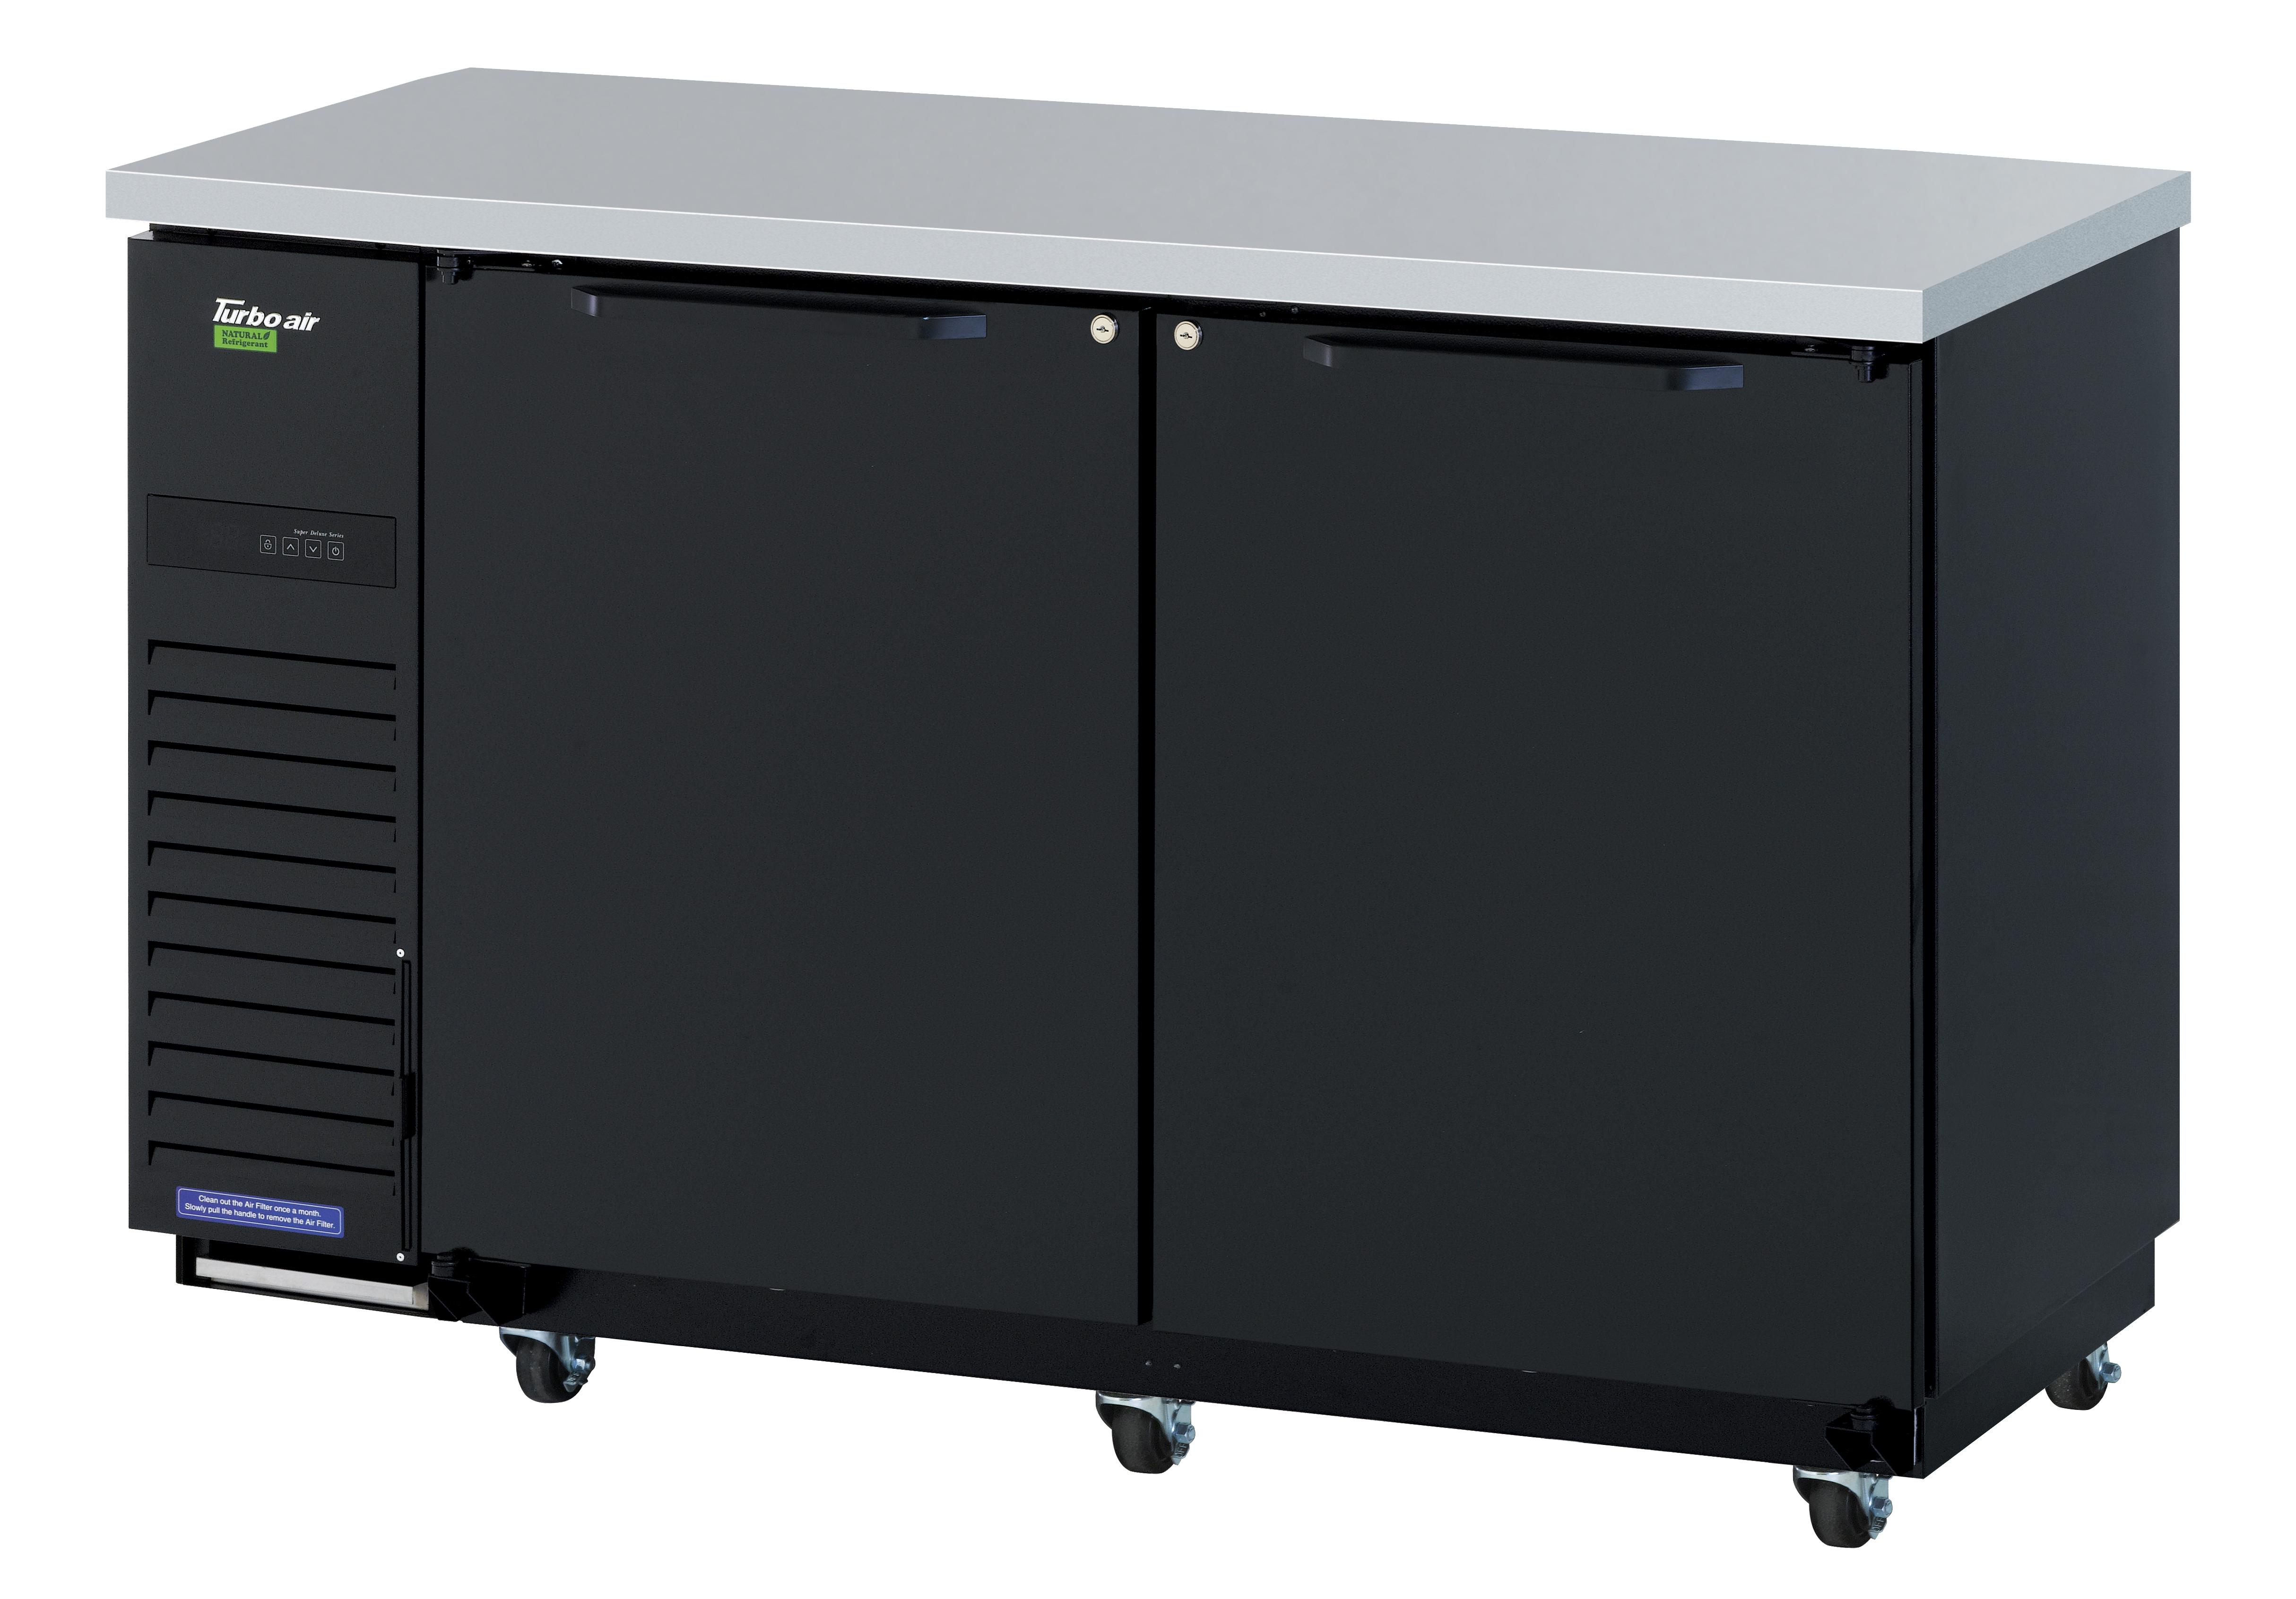 Turbo Air TBB-24-60SBD-N6 back bar cabinet, refrigerated